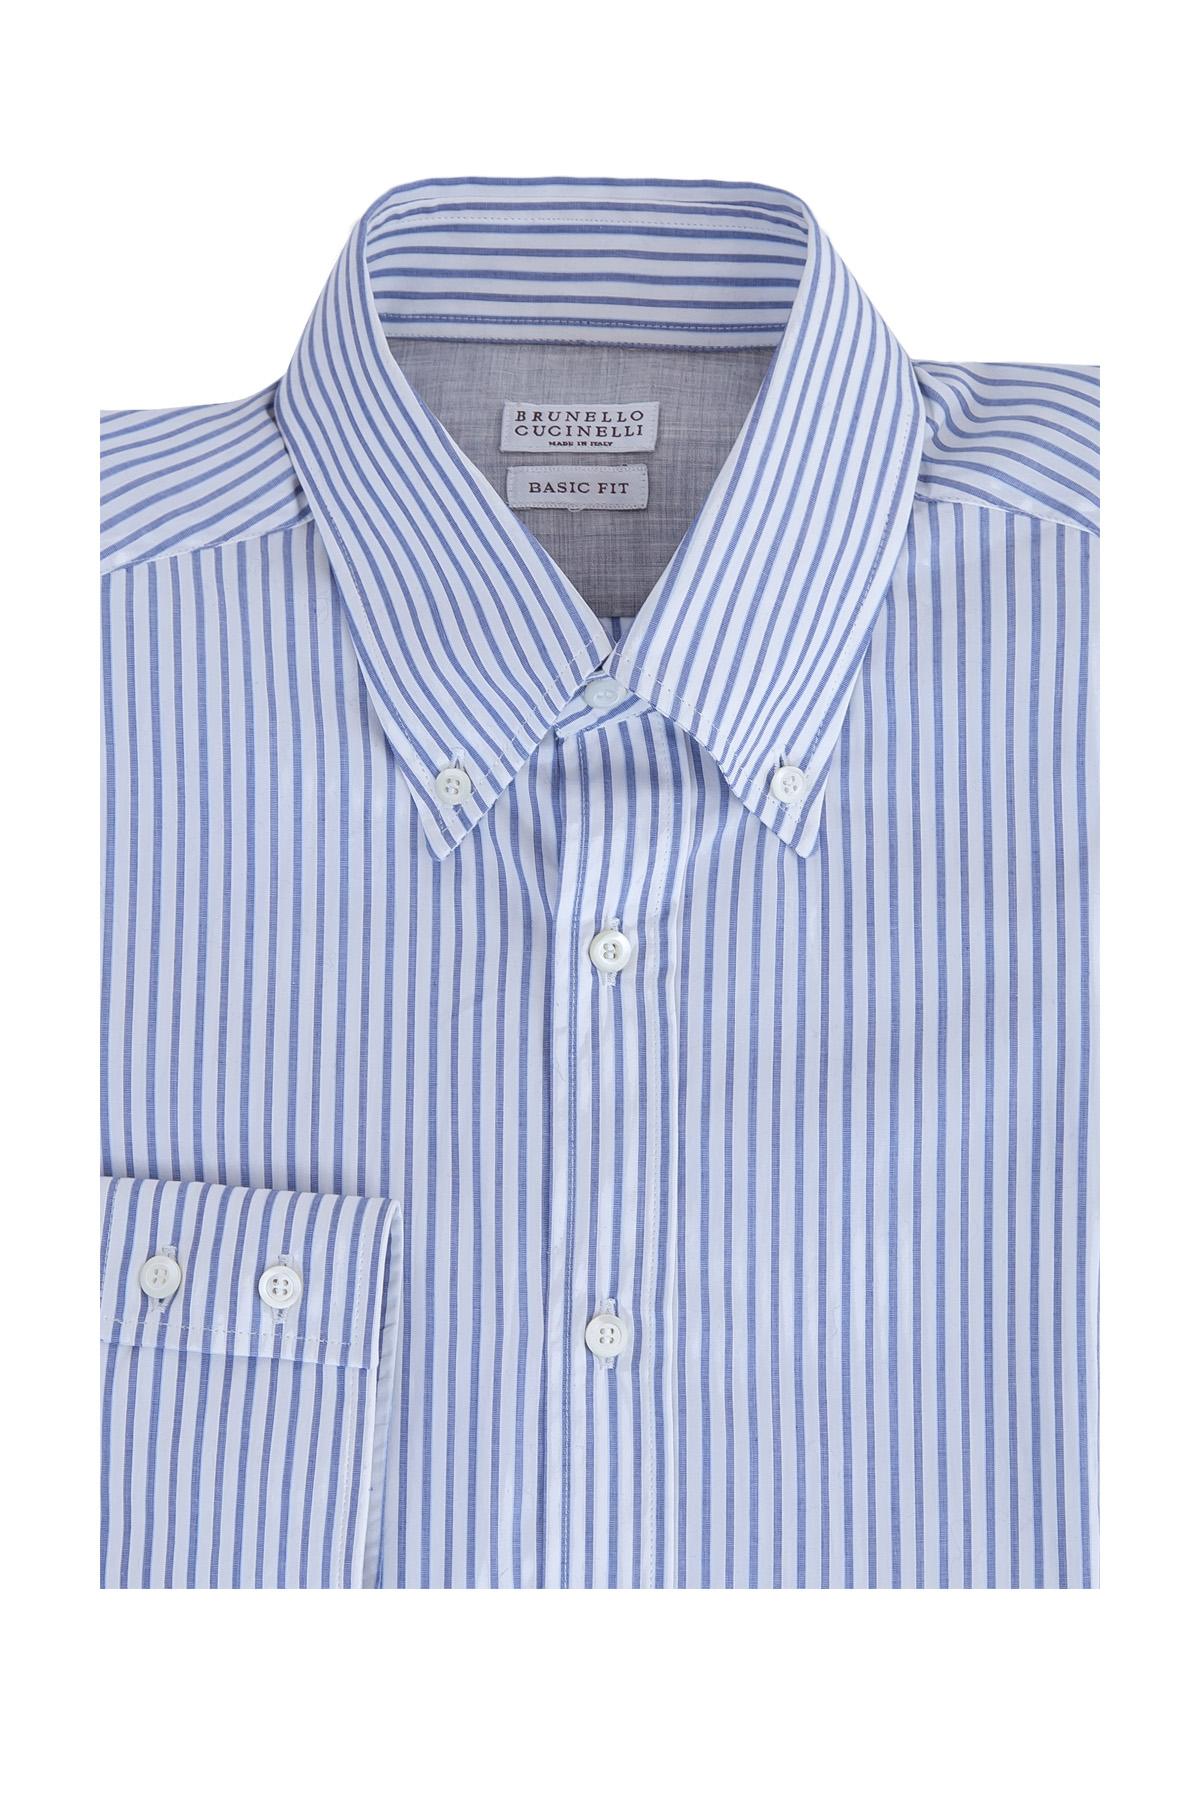 Купить Рубашка, BRUNELLO CUCINELLI, Италия, хлопок 100%